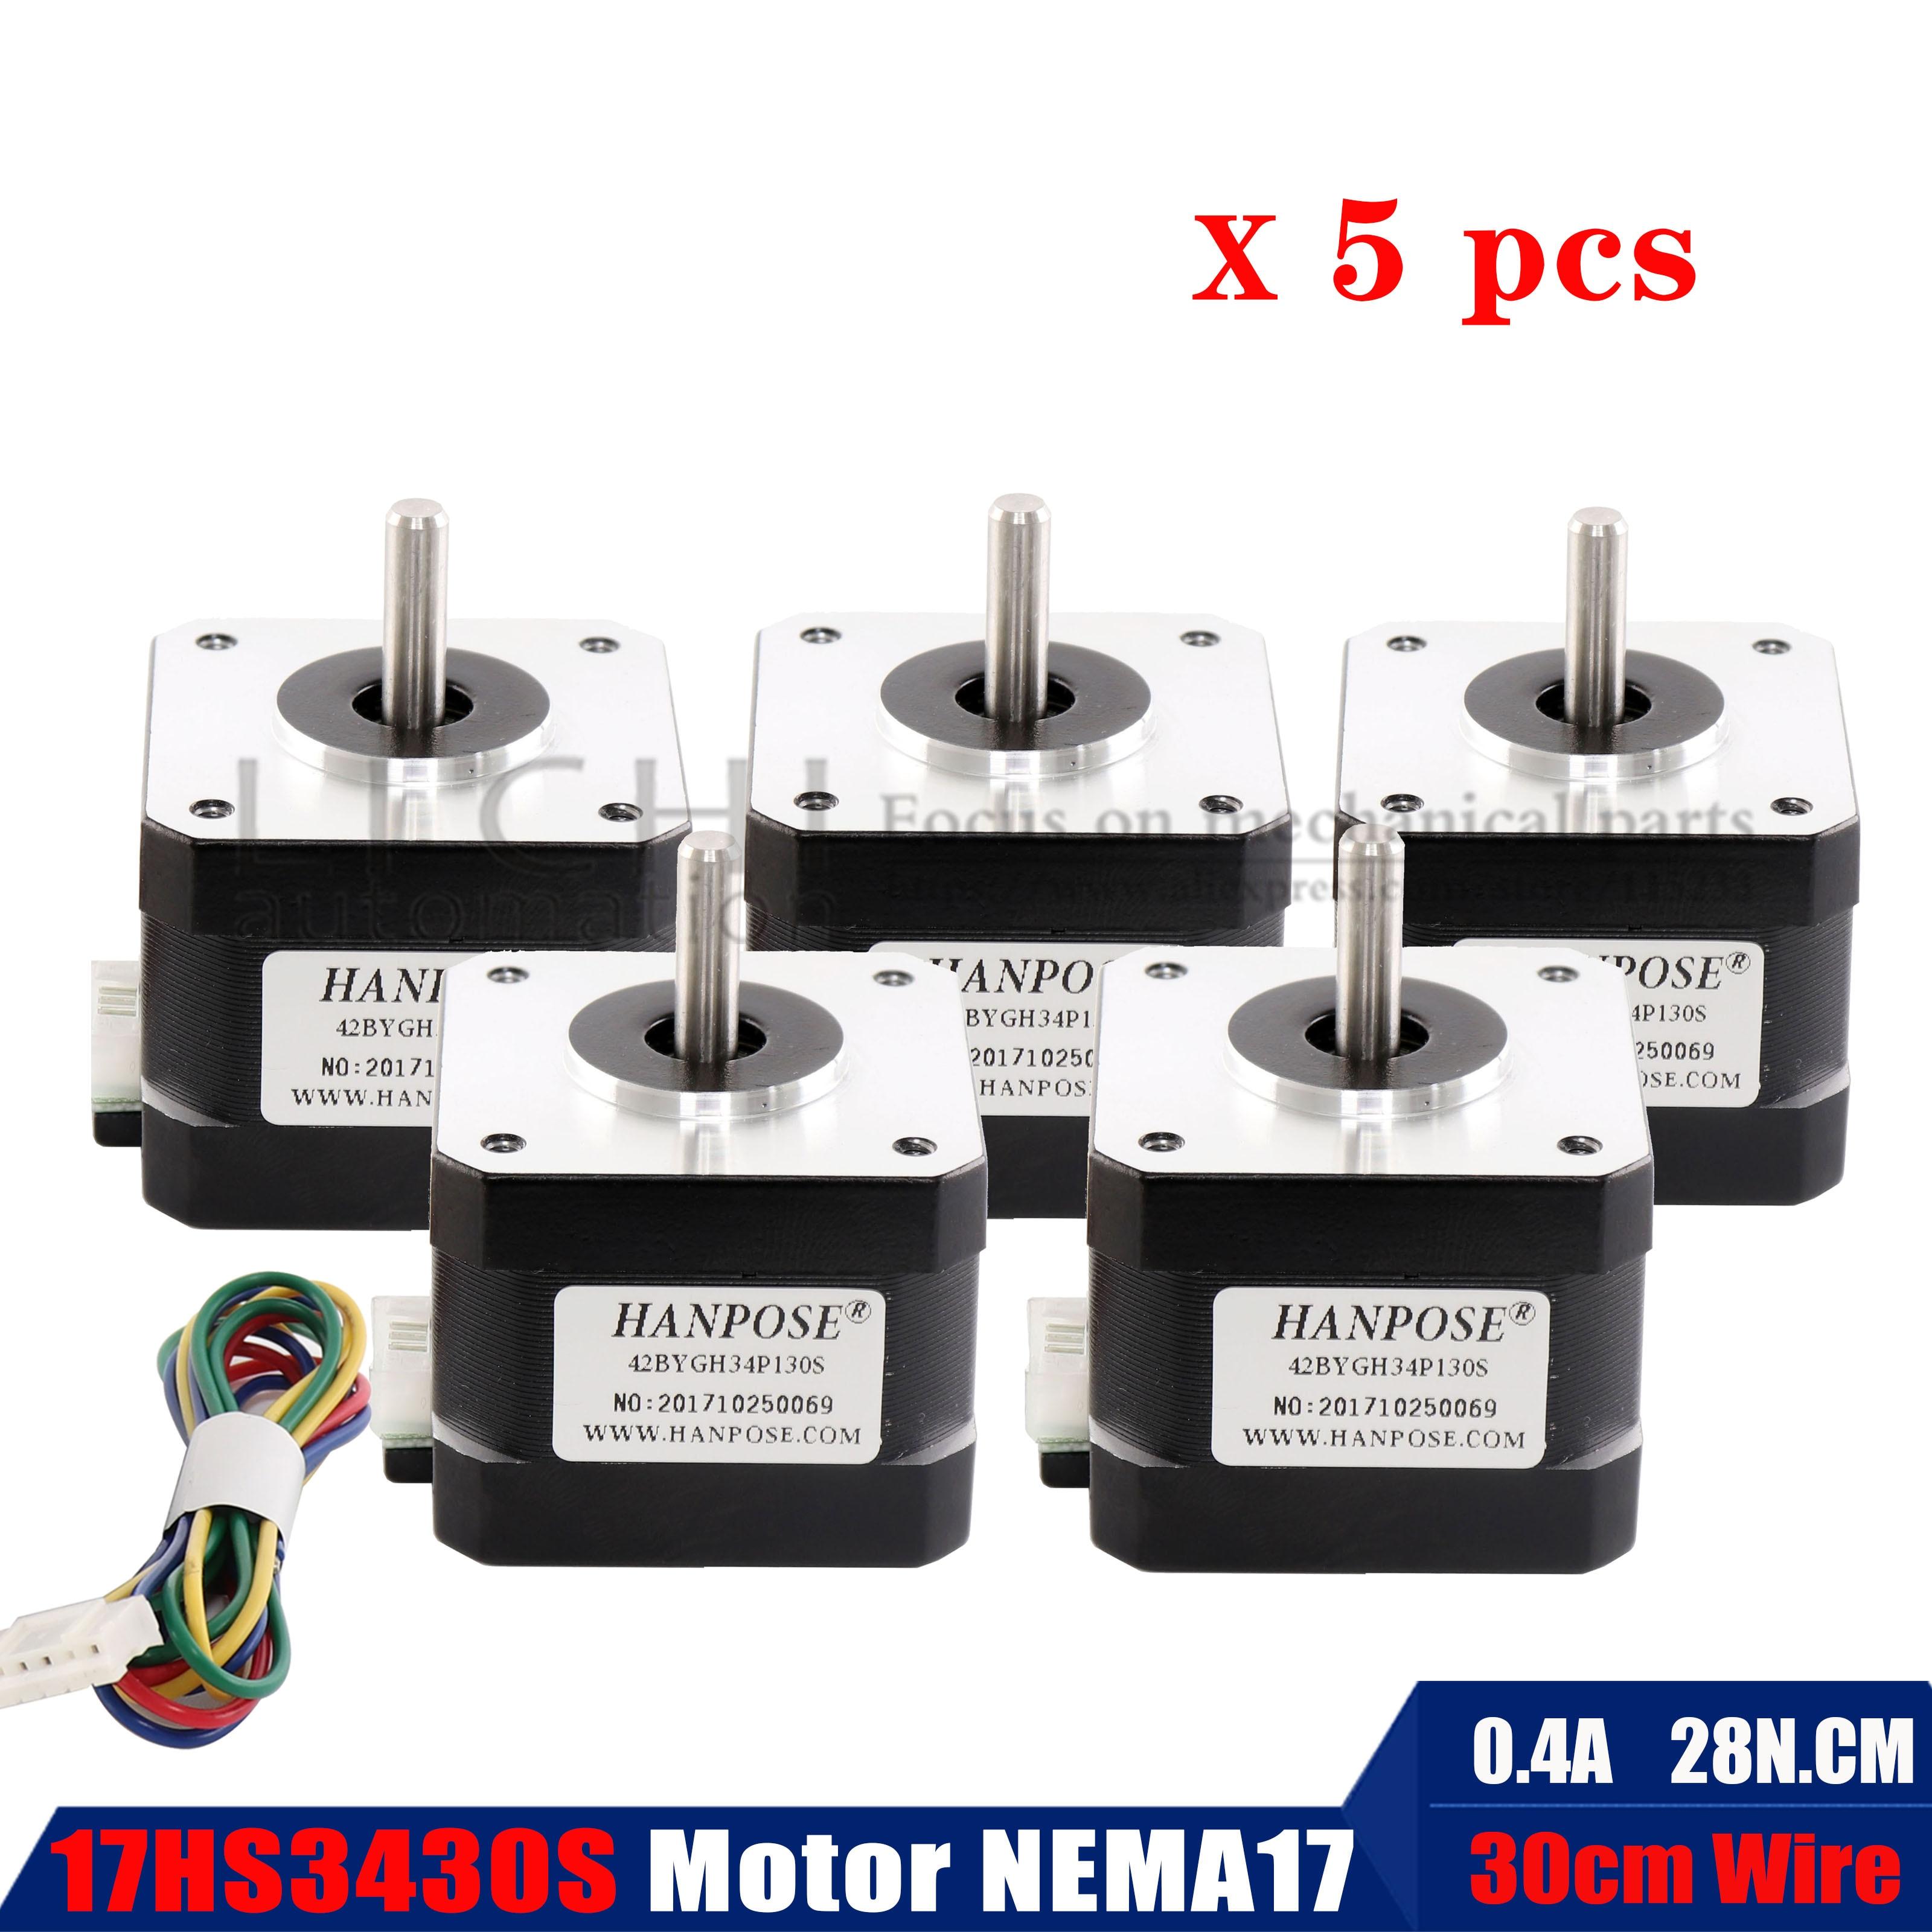 (17HS3430) 5 uds 0,4a Nema17 Motor paso a paso 42 motor BYGH para CNC XYZ para impresora 3D Motor paso a paso